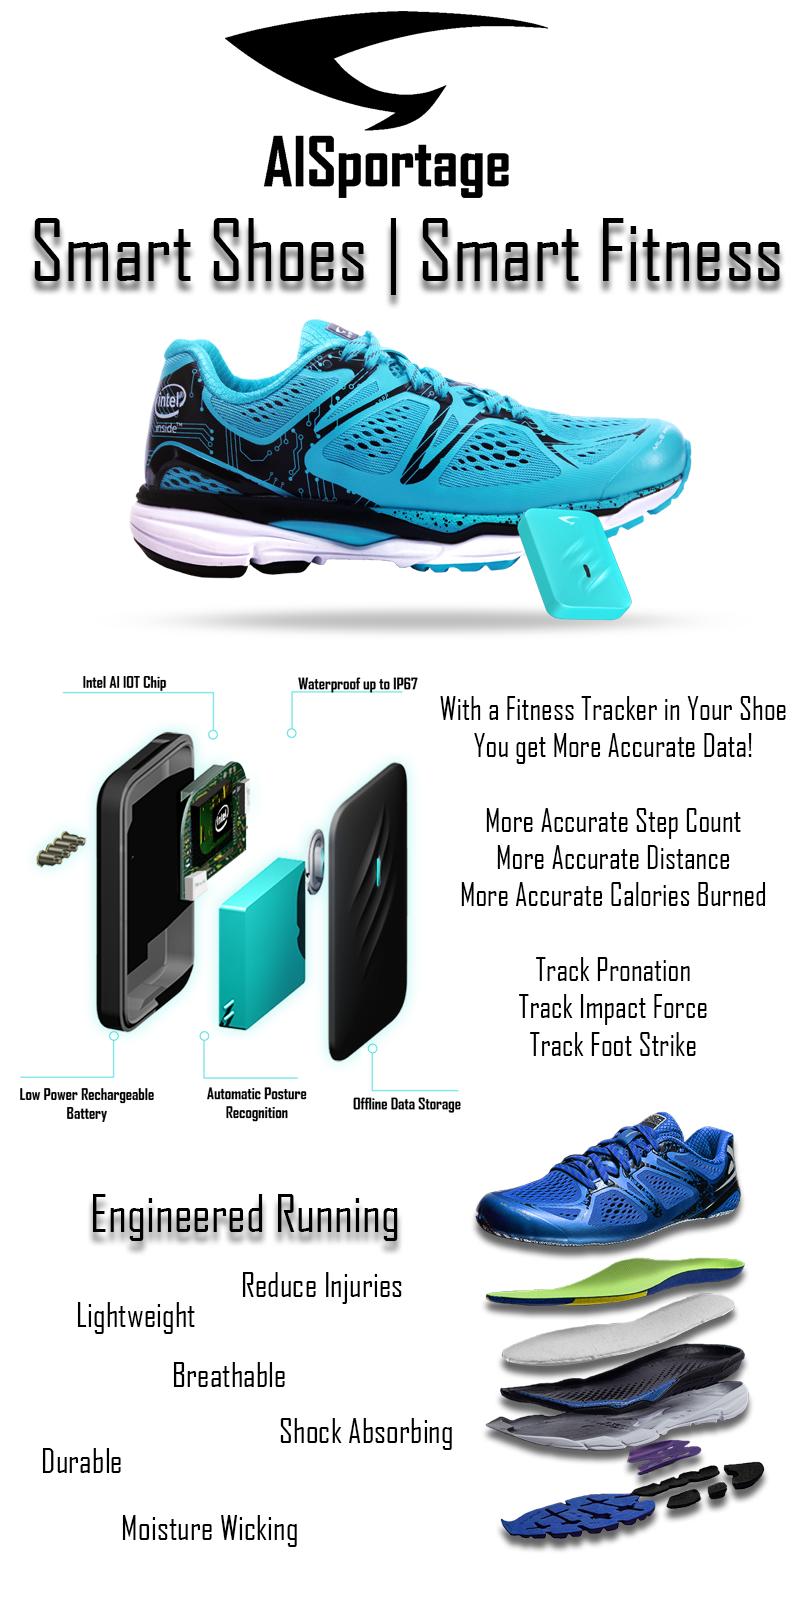 Digital Running Shoes – Smart AI Shoes